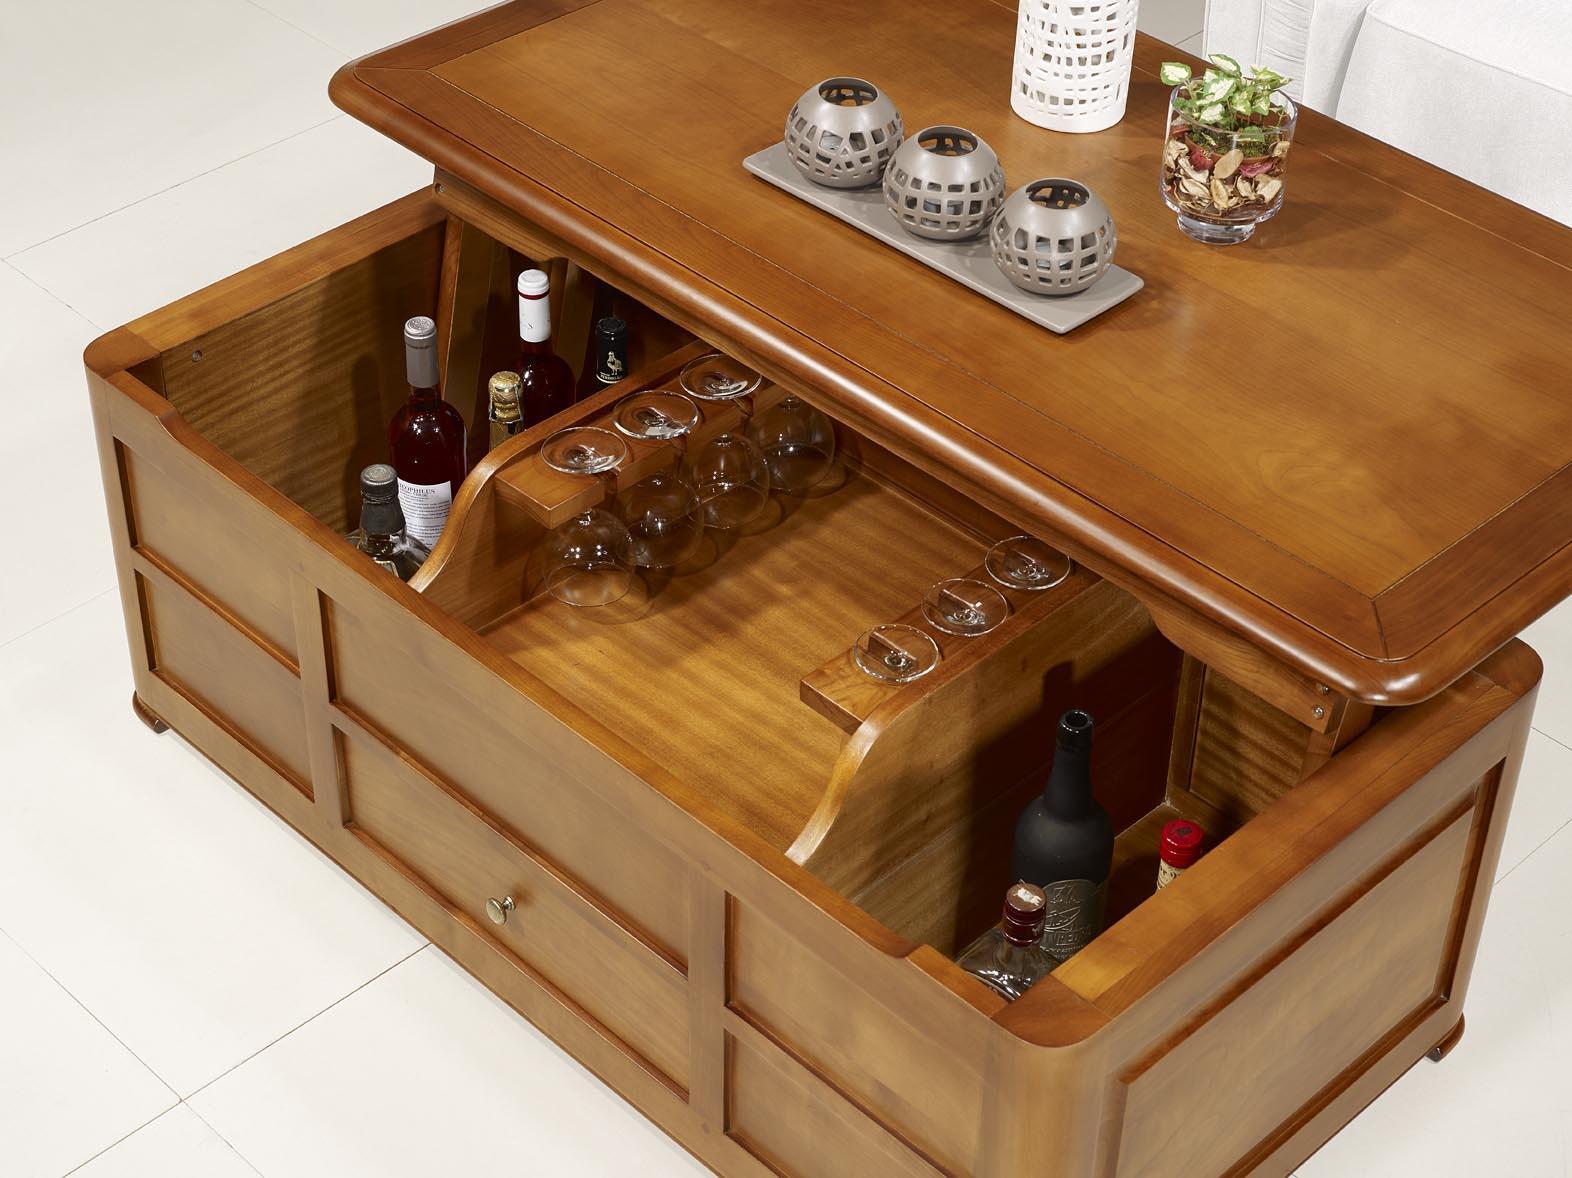 Table basse bar ine en merisier de style louis philippe meuble en merisier massif - Meuble merisier style louis philippe ...